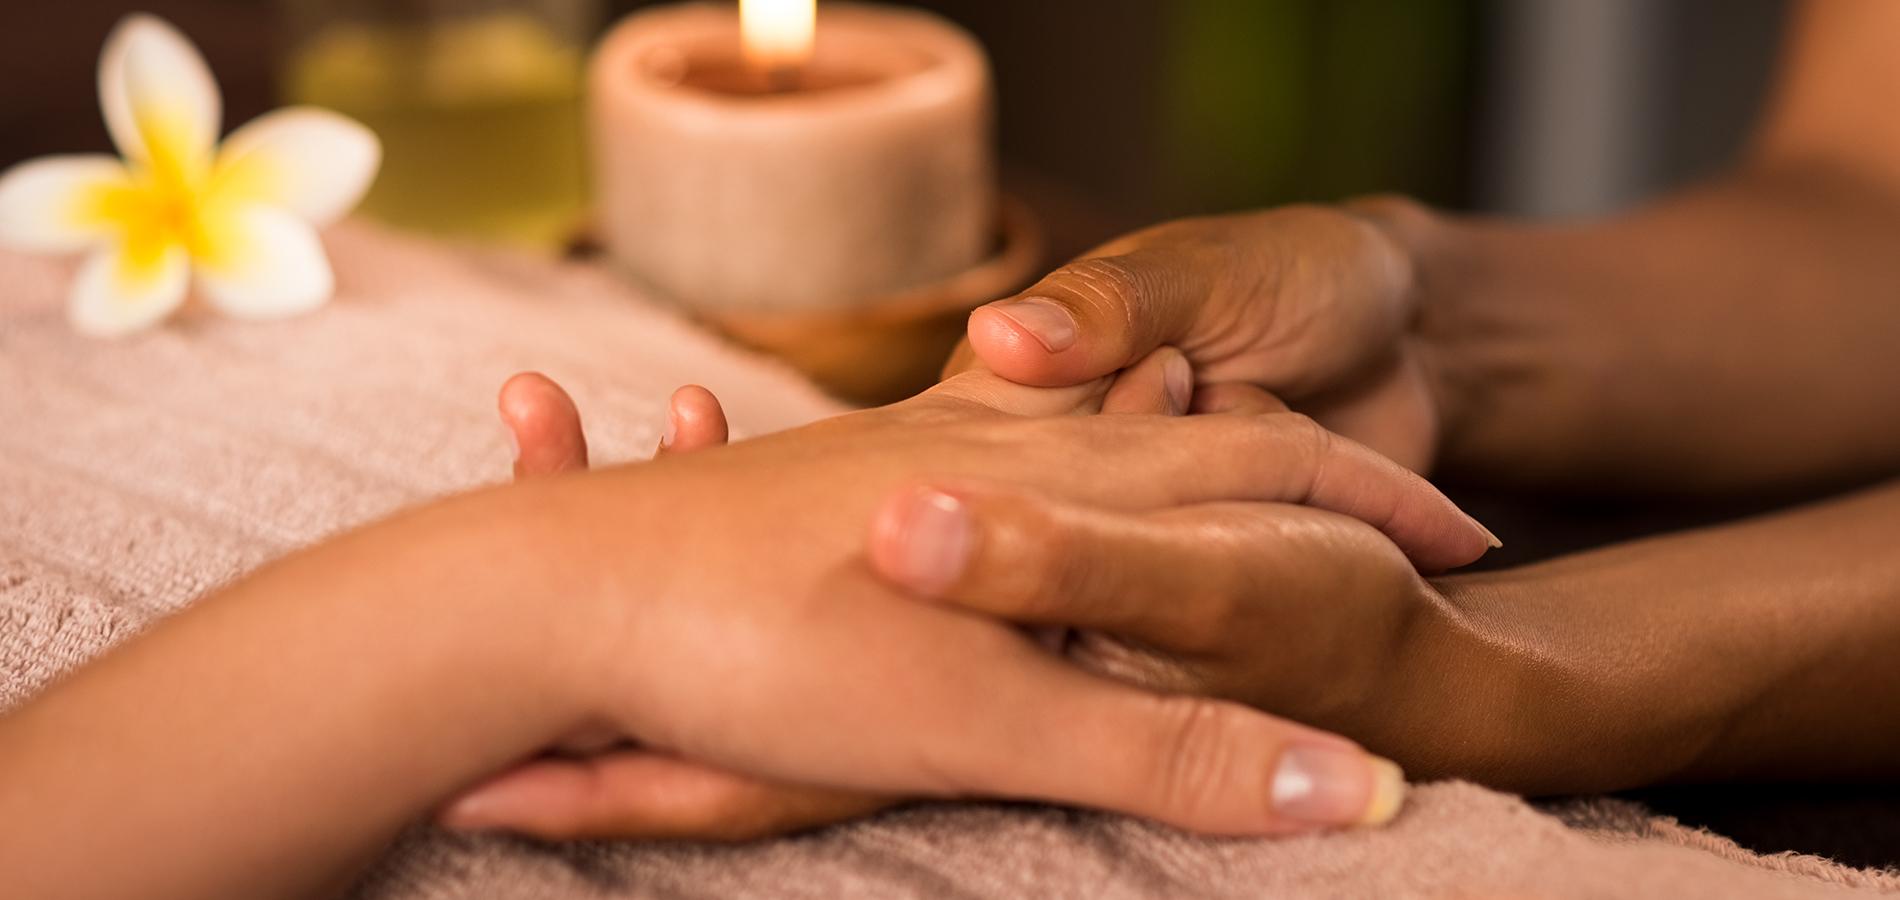 Nail_Garden_Michigan-Hand Massage